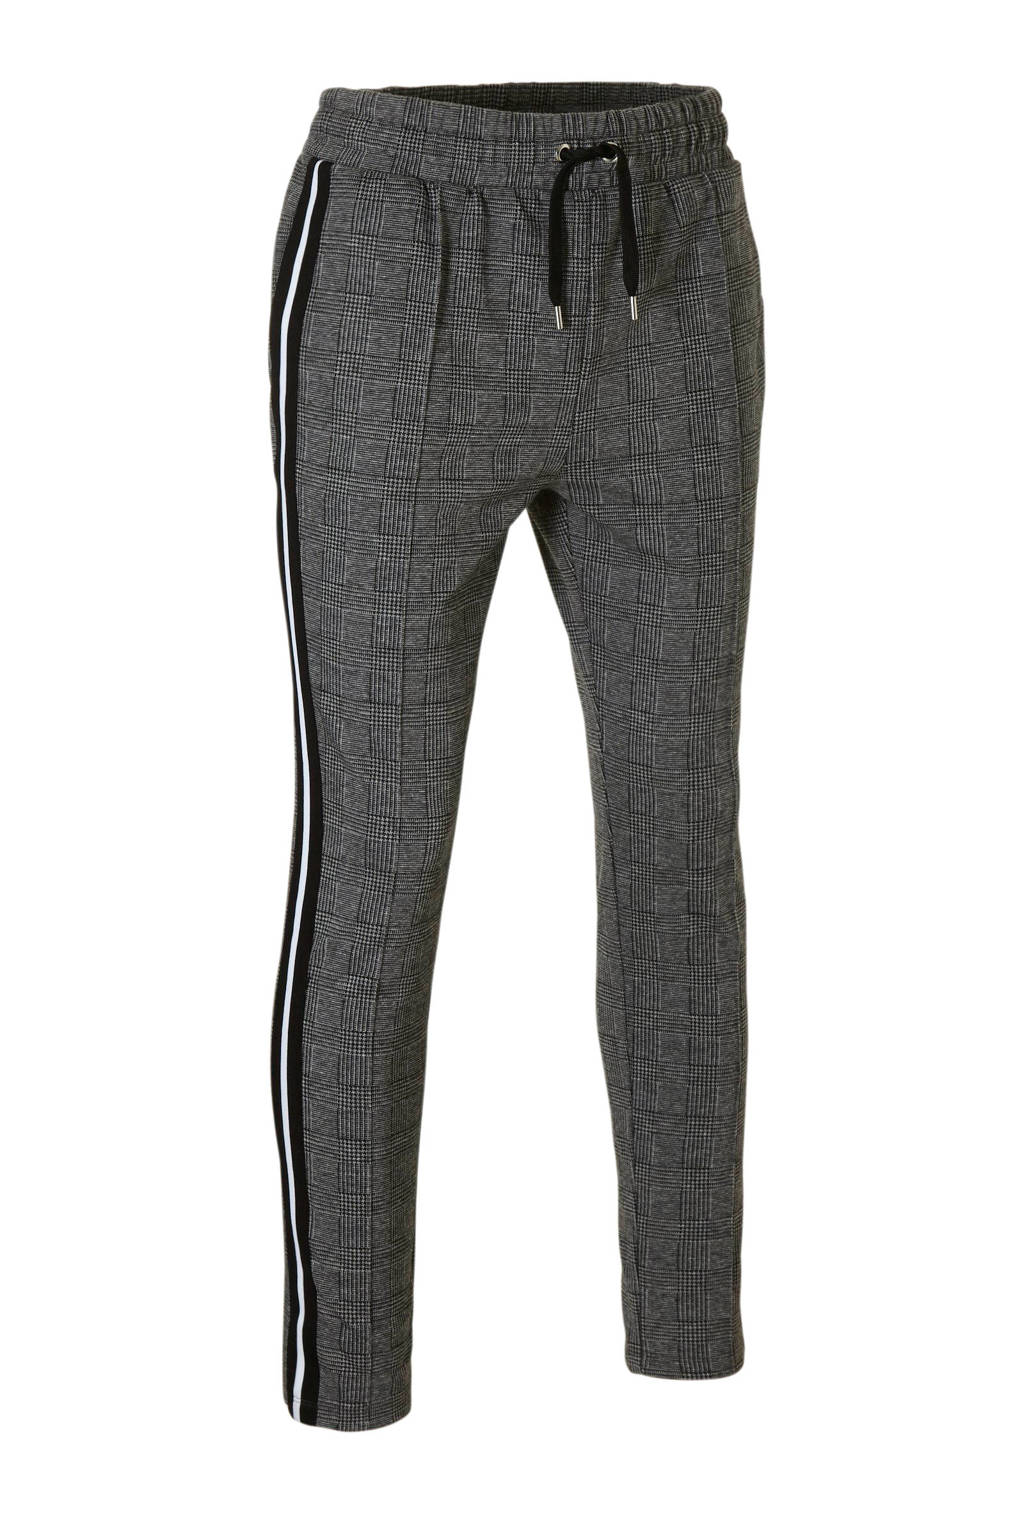 River Island pantalon, Grijs melange